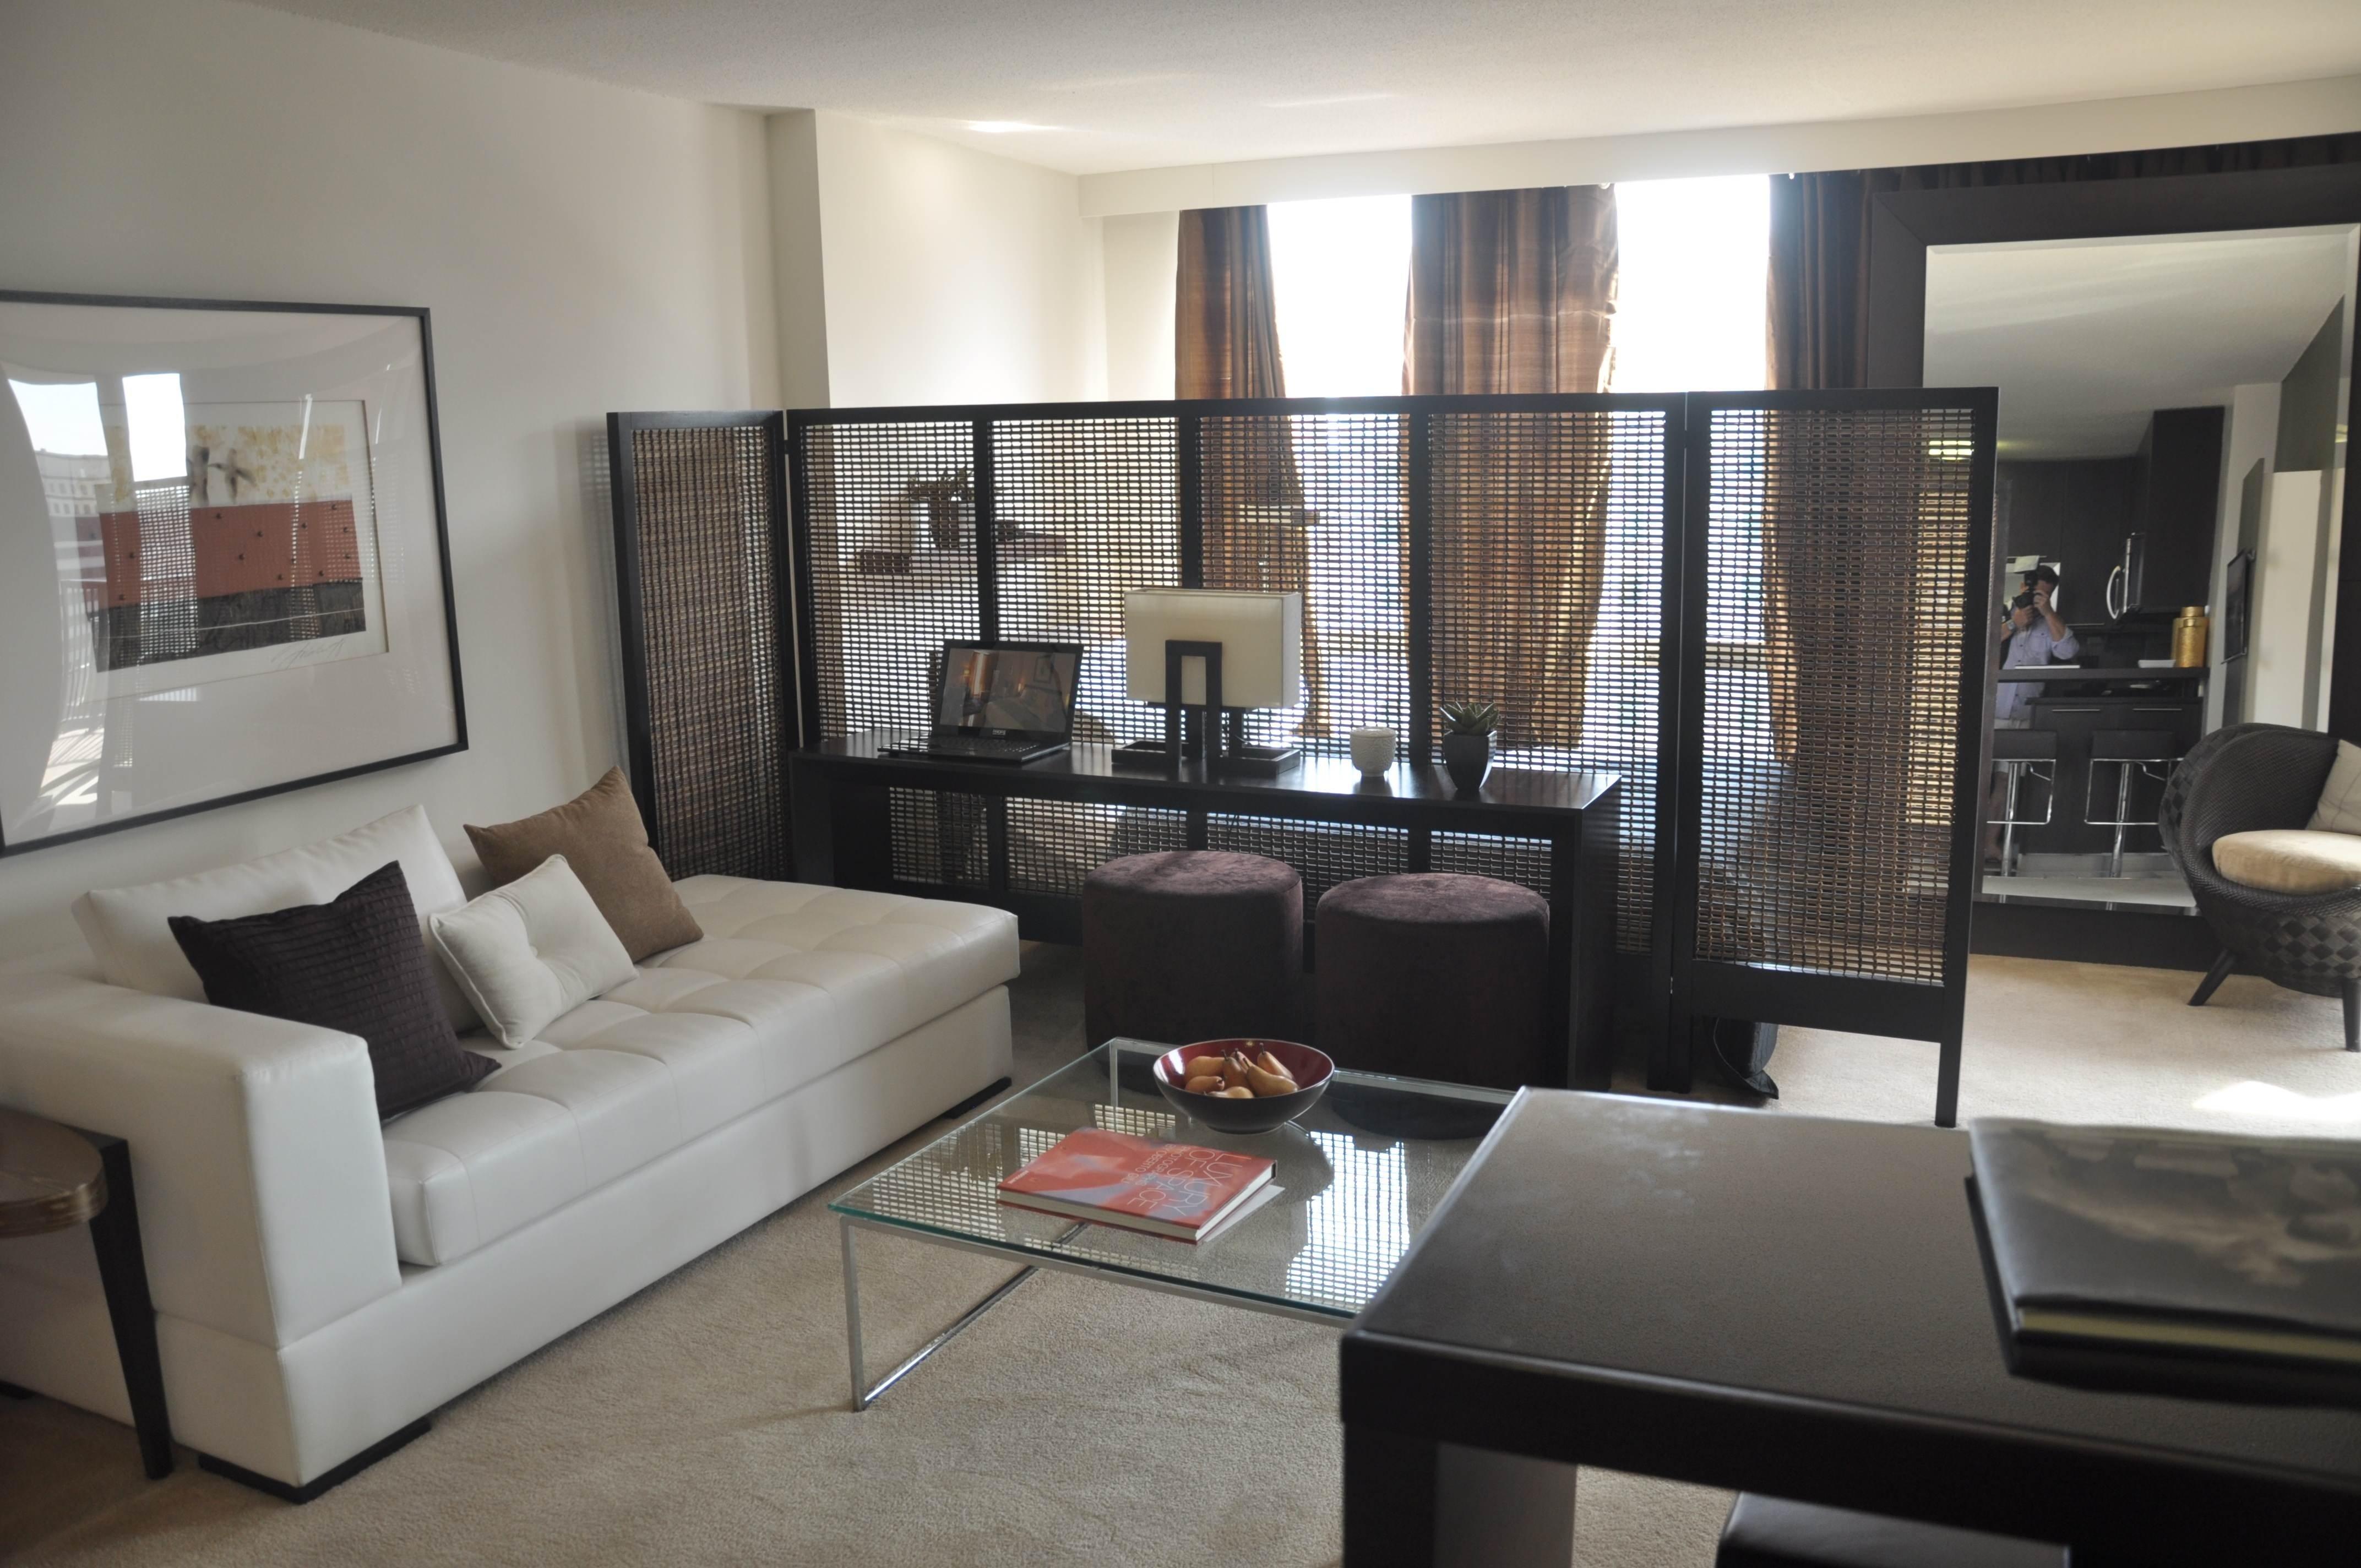 10 Pretty Decorating Ideas For Studio Apartments designs for studio apartments apartment decorating ffdaa 2020